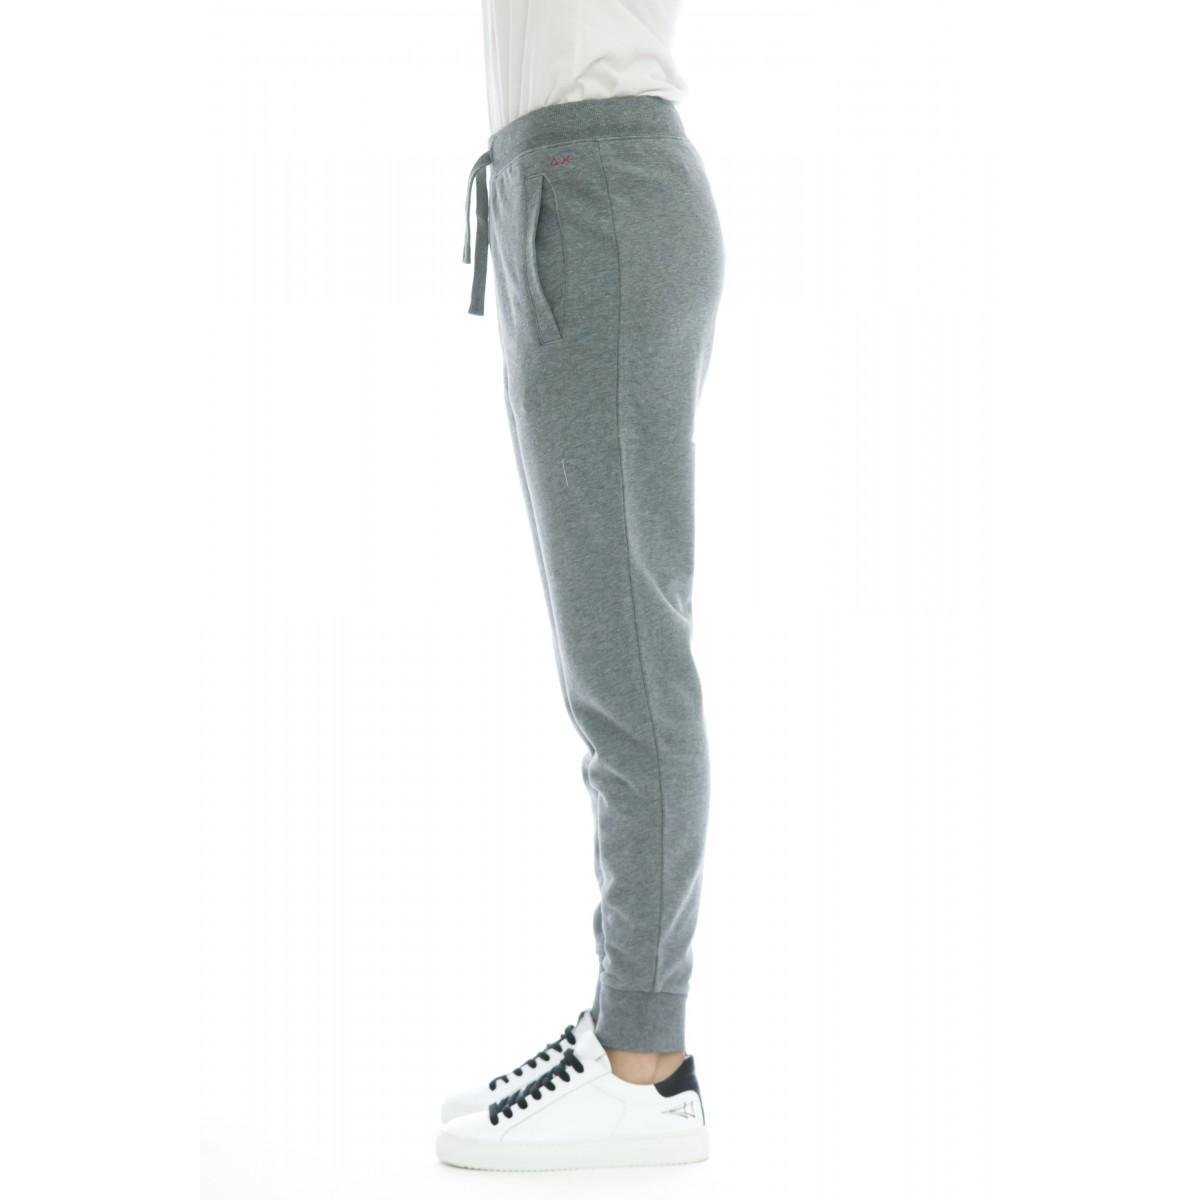 Pantalone donna - F30206 pantalone tuta jogging